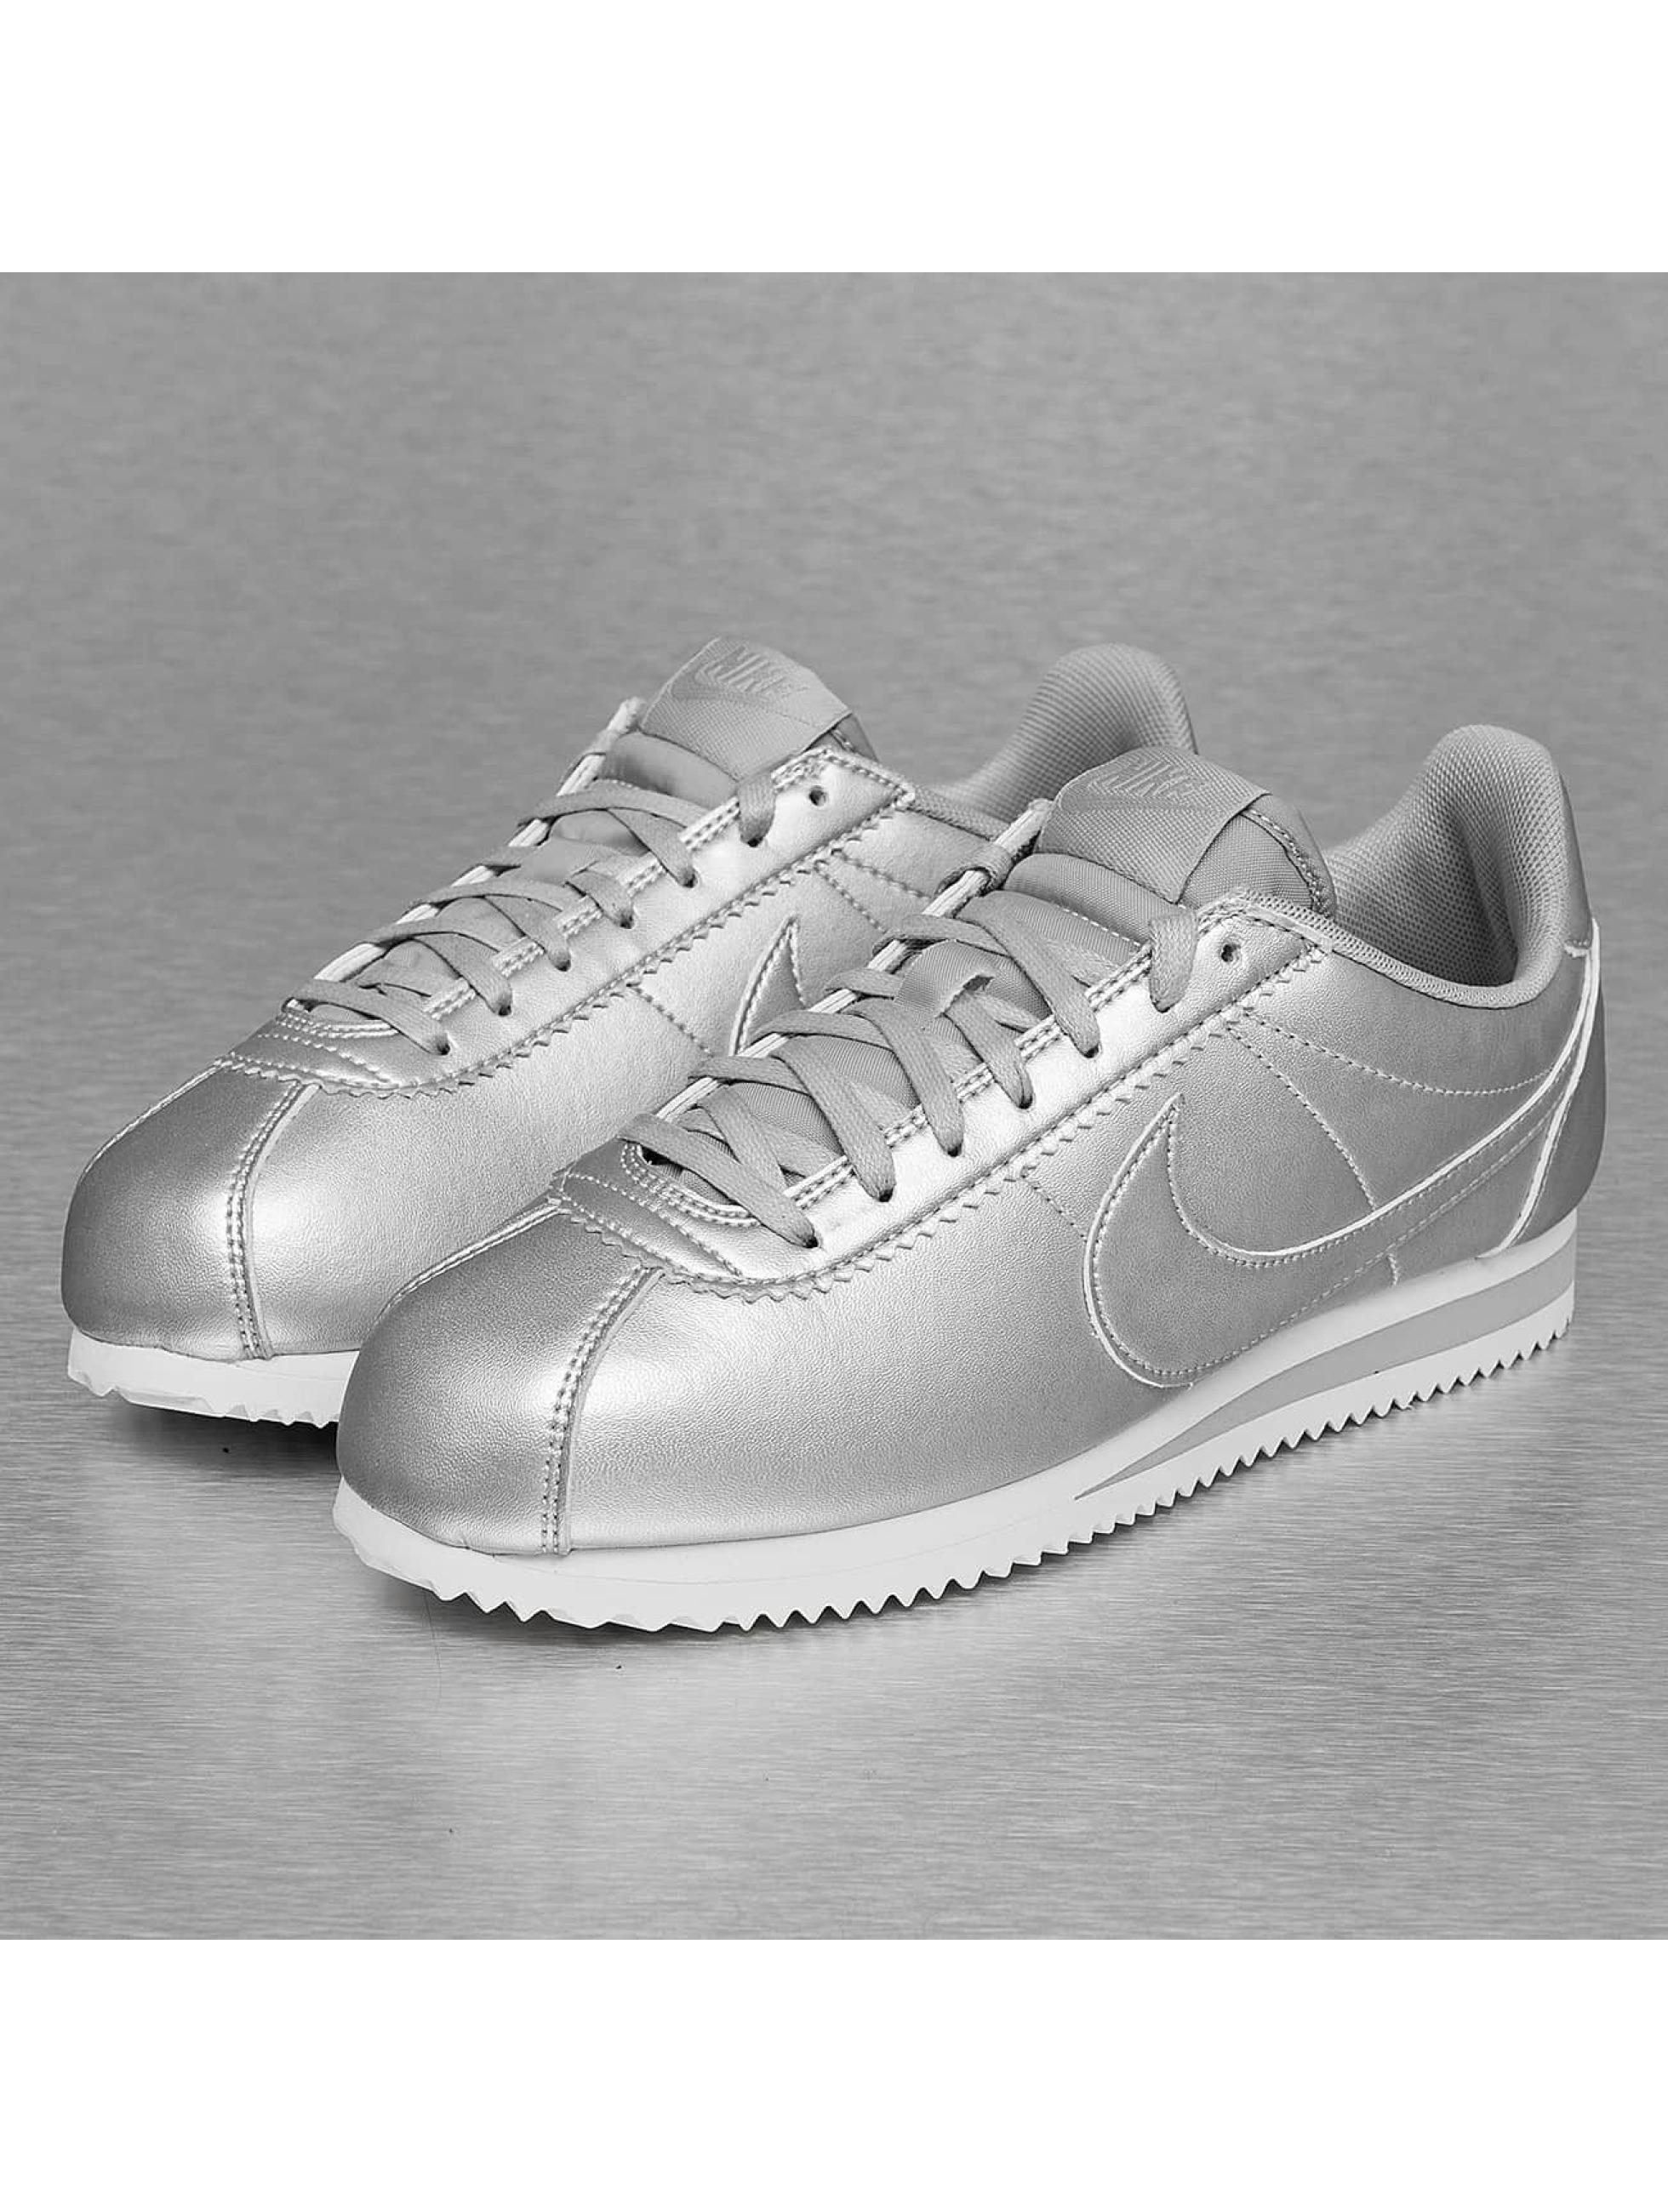 Sneaker Classic Cortez Leather in silberfarben